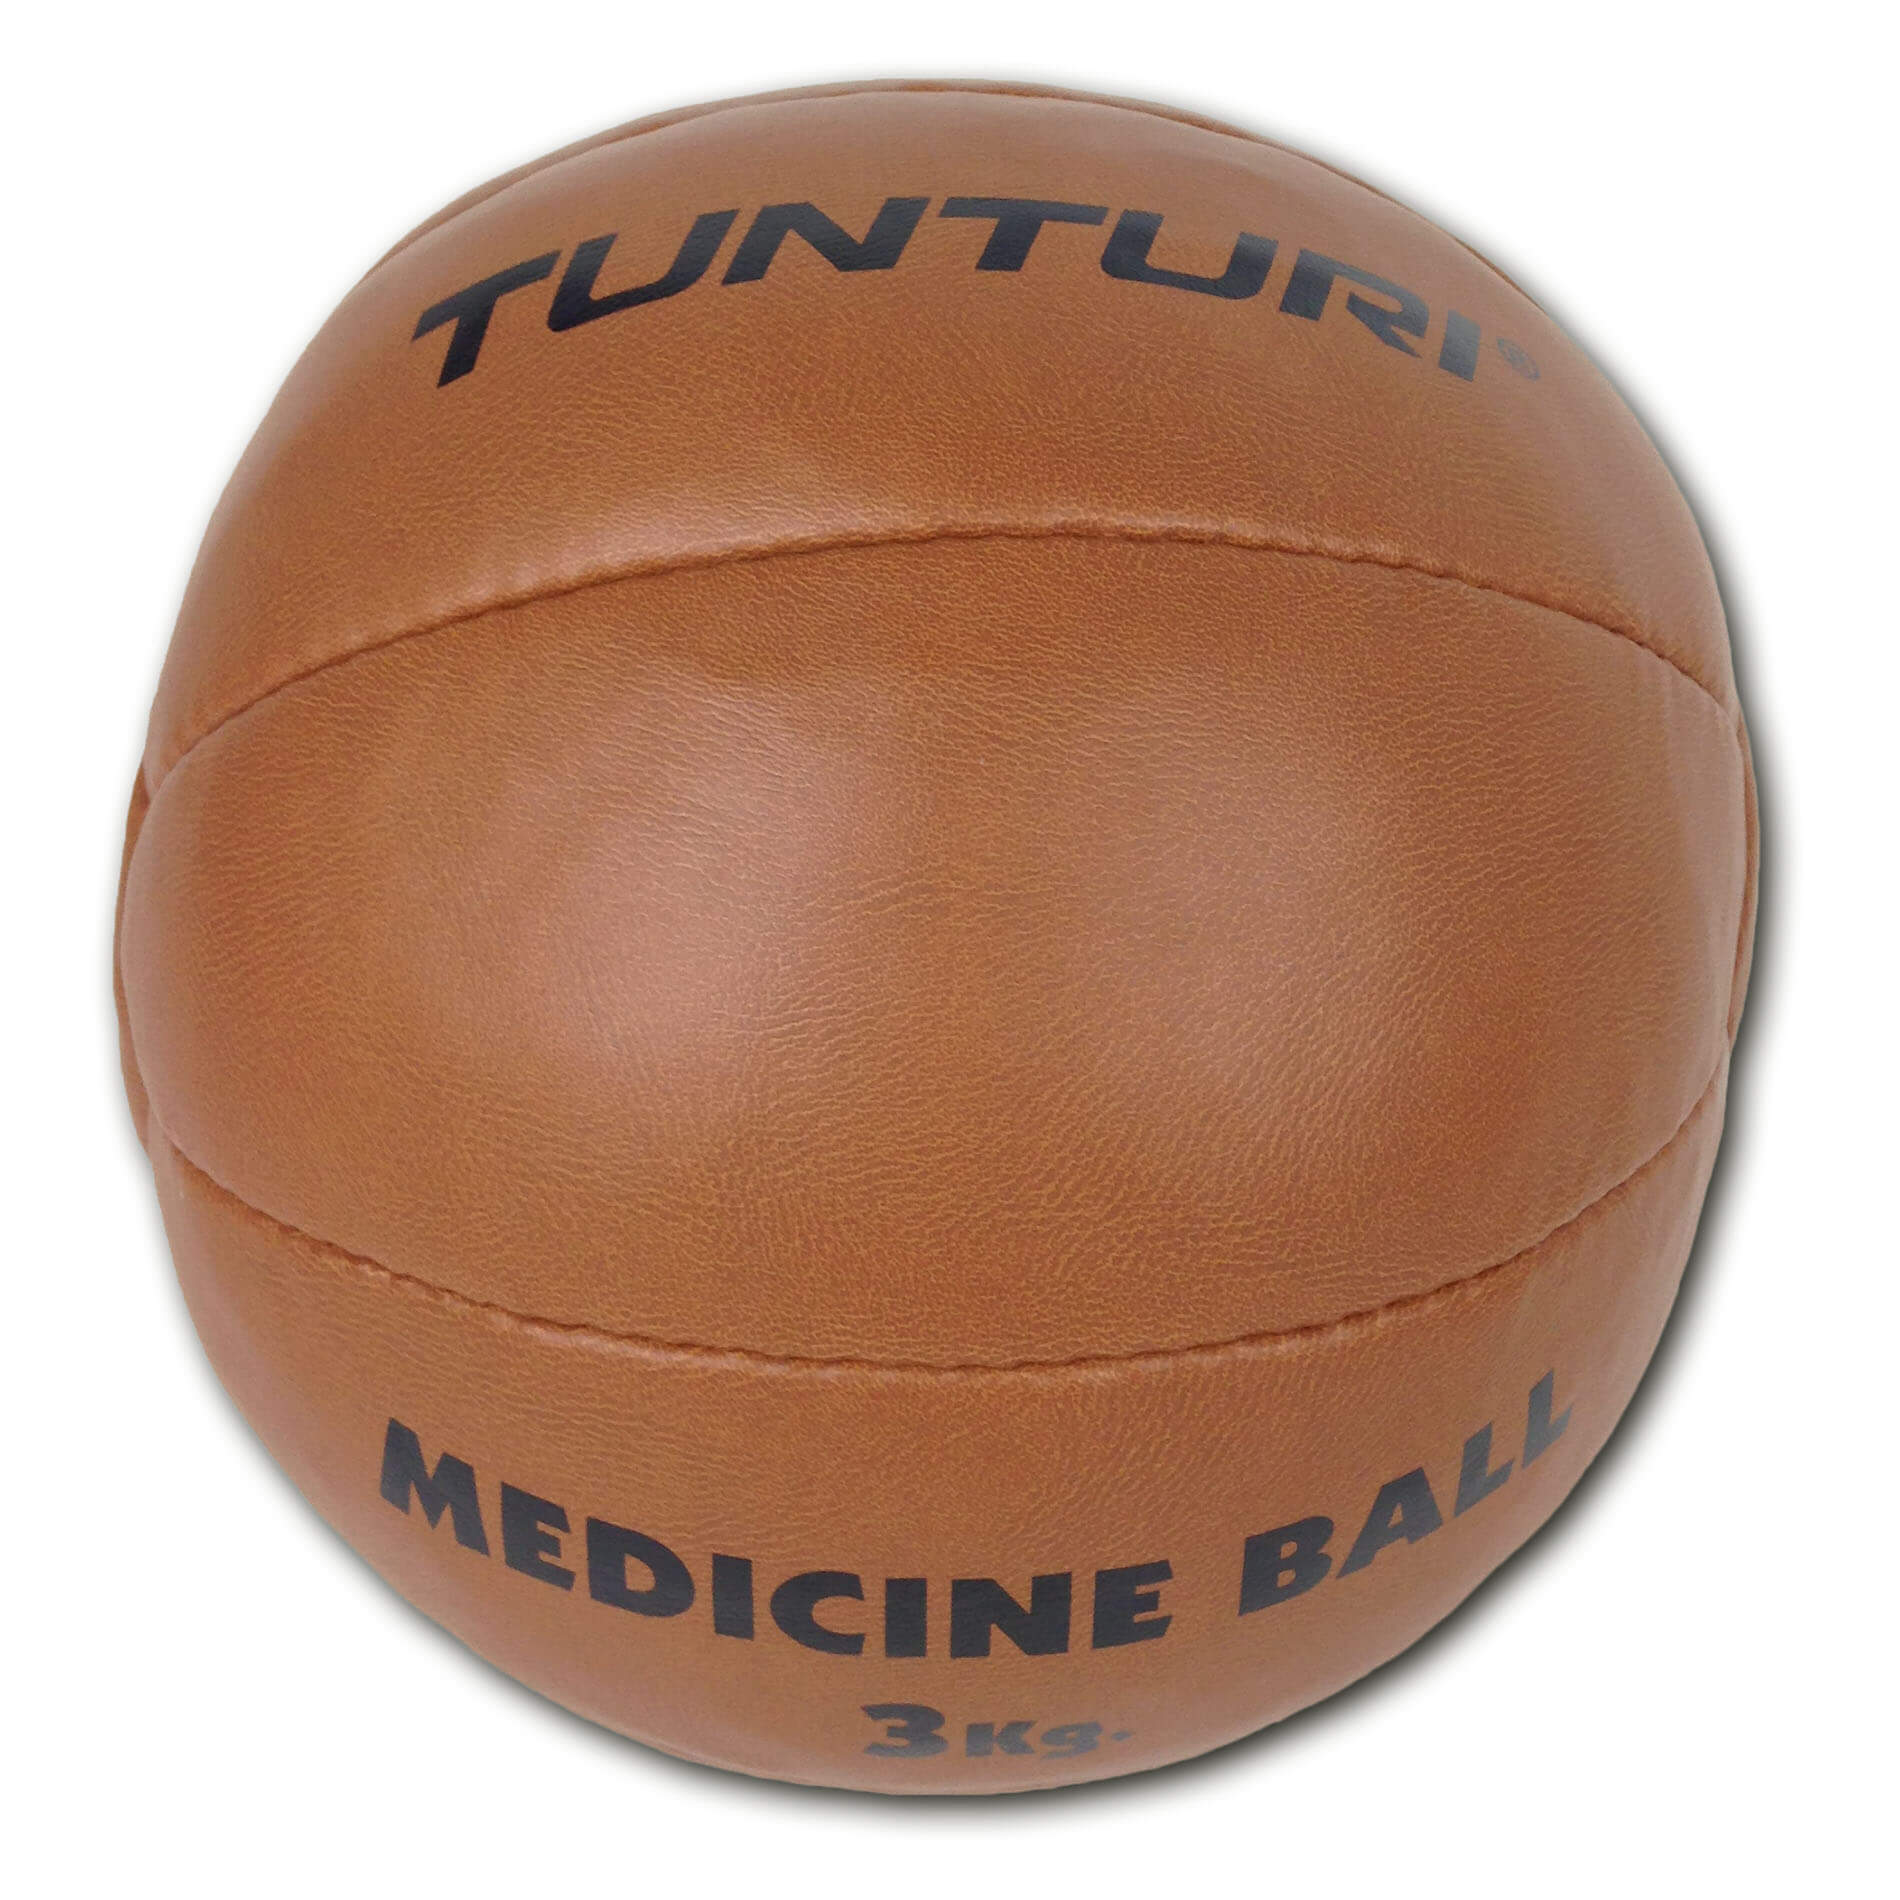 Medicine Ball - Medicijnbal - kunst leer